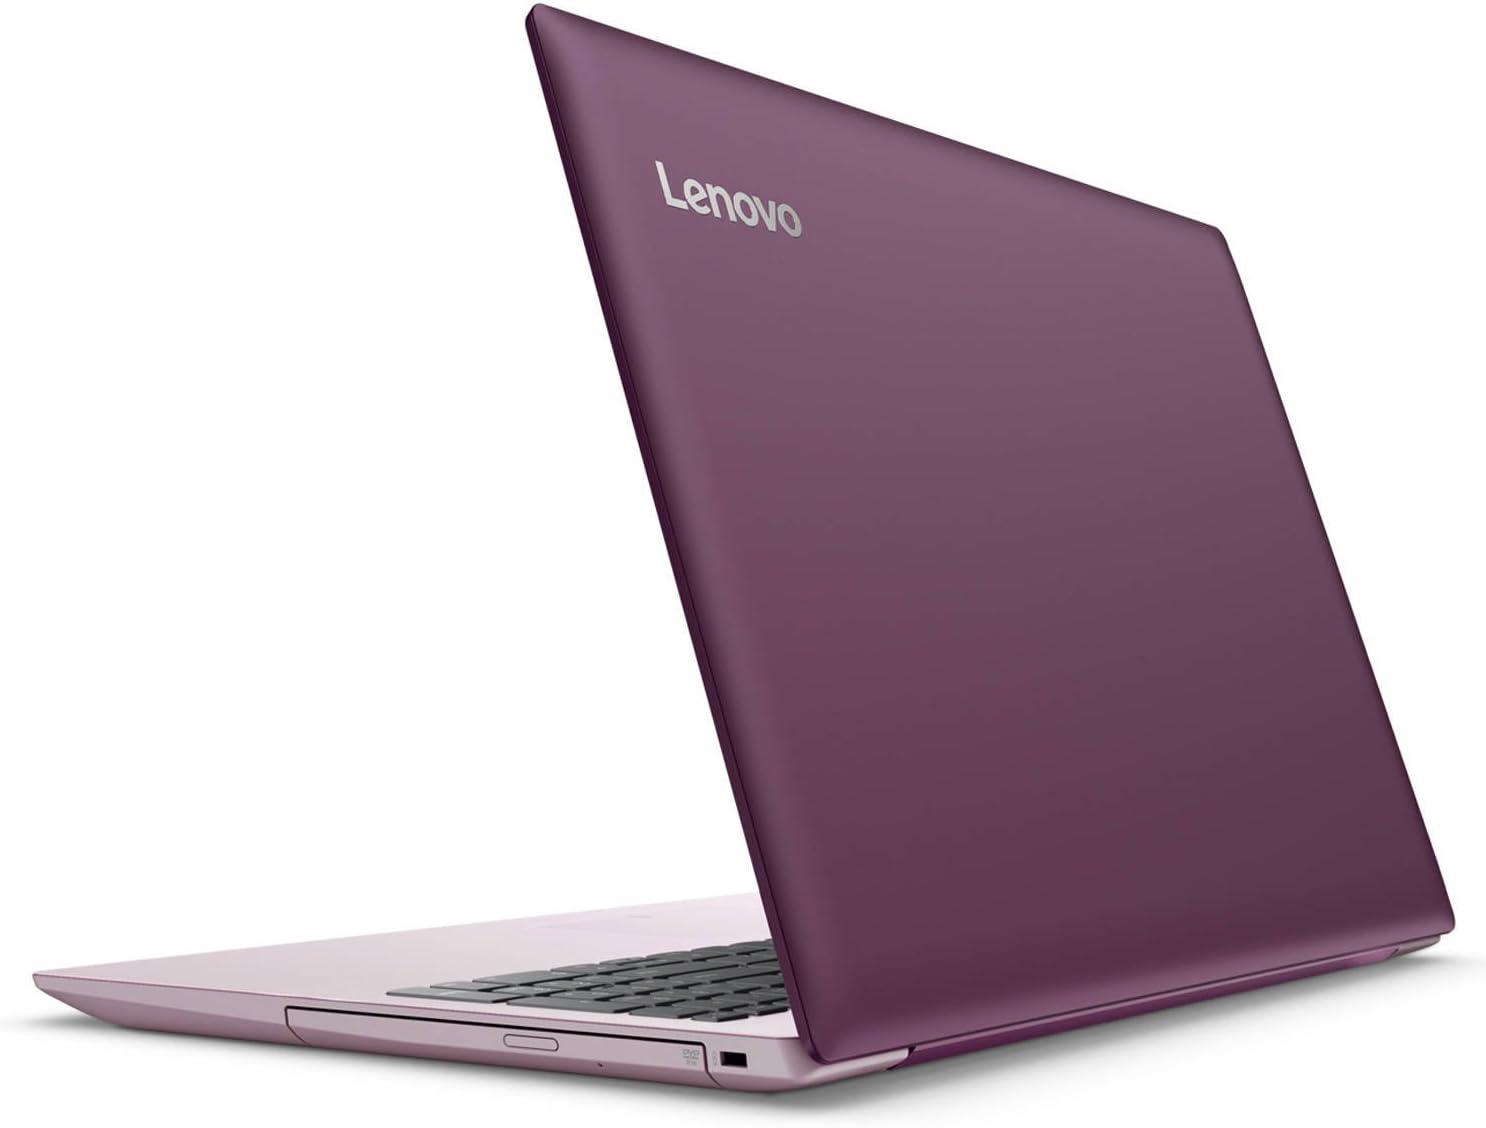 "Lenovo ideapad 320 15.6"" Laptop, Windows 10, Intel Celeron N3350 Dual-Core Processor, 4GB RAM, 1TB Hard Drive"